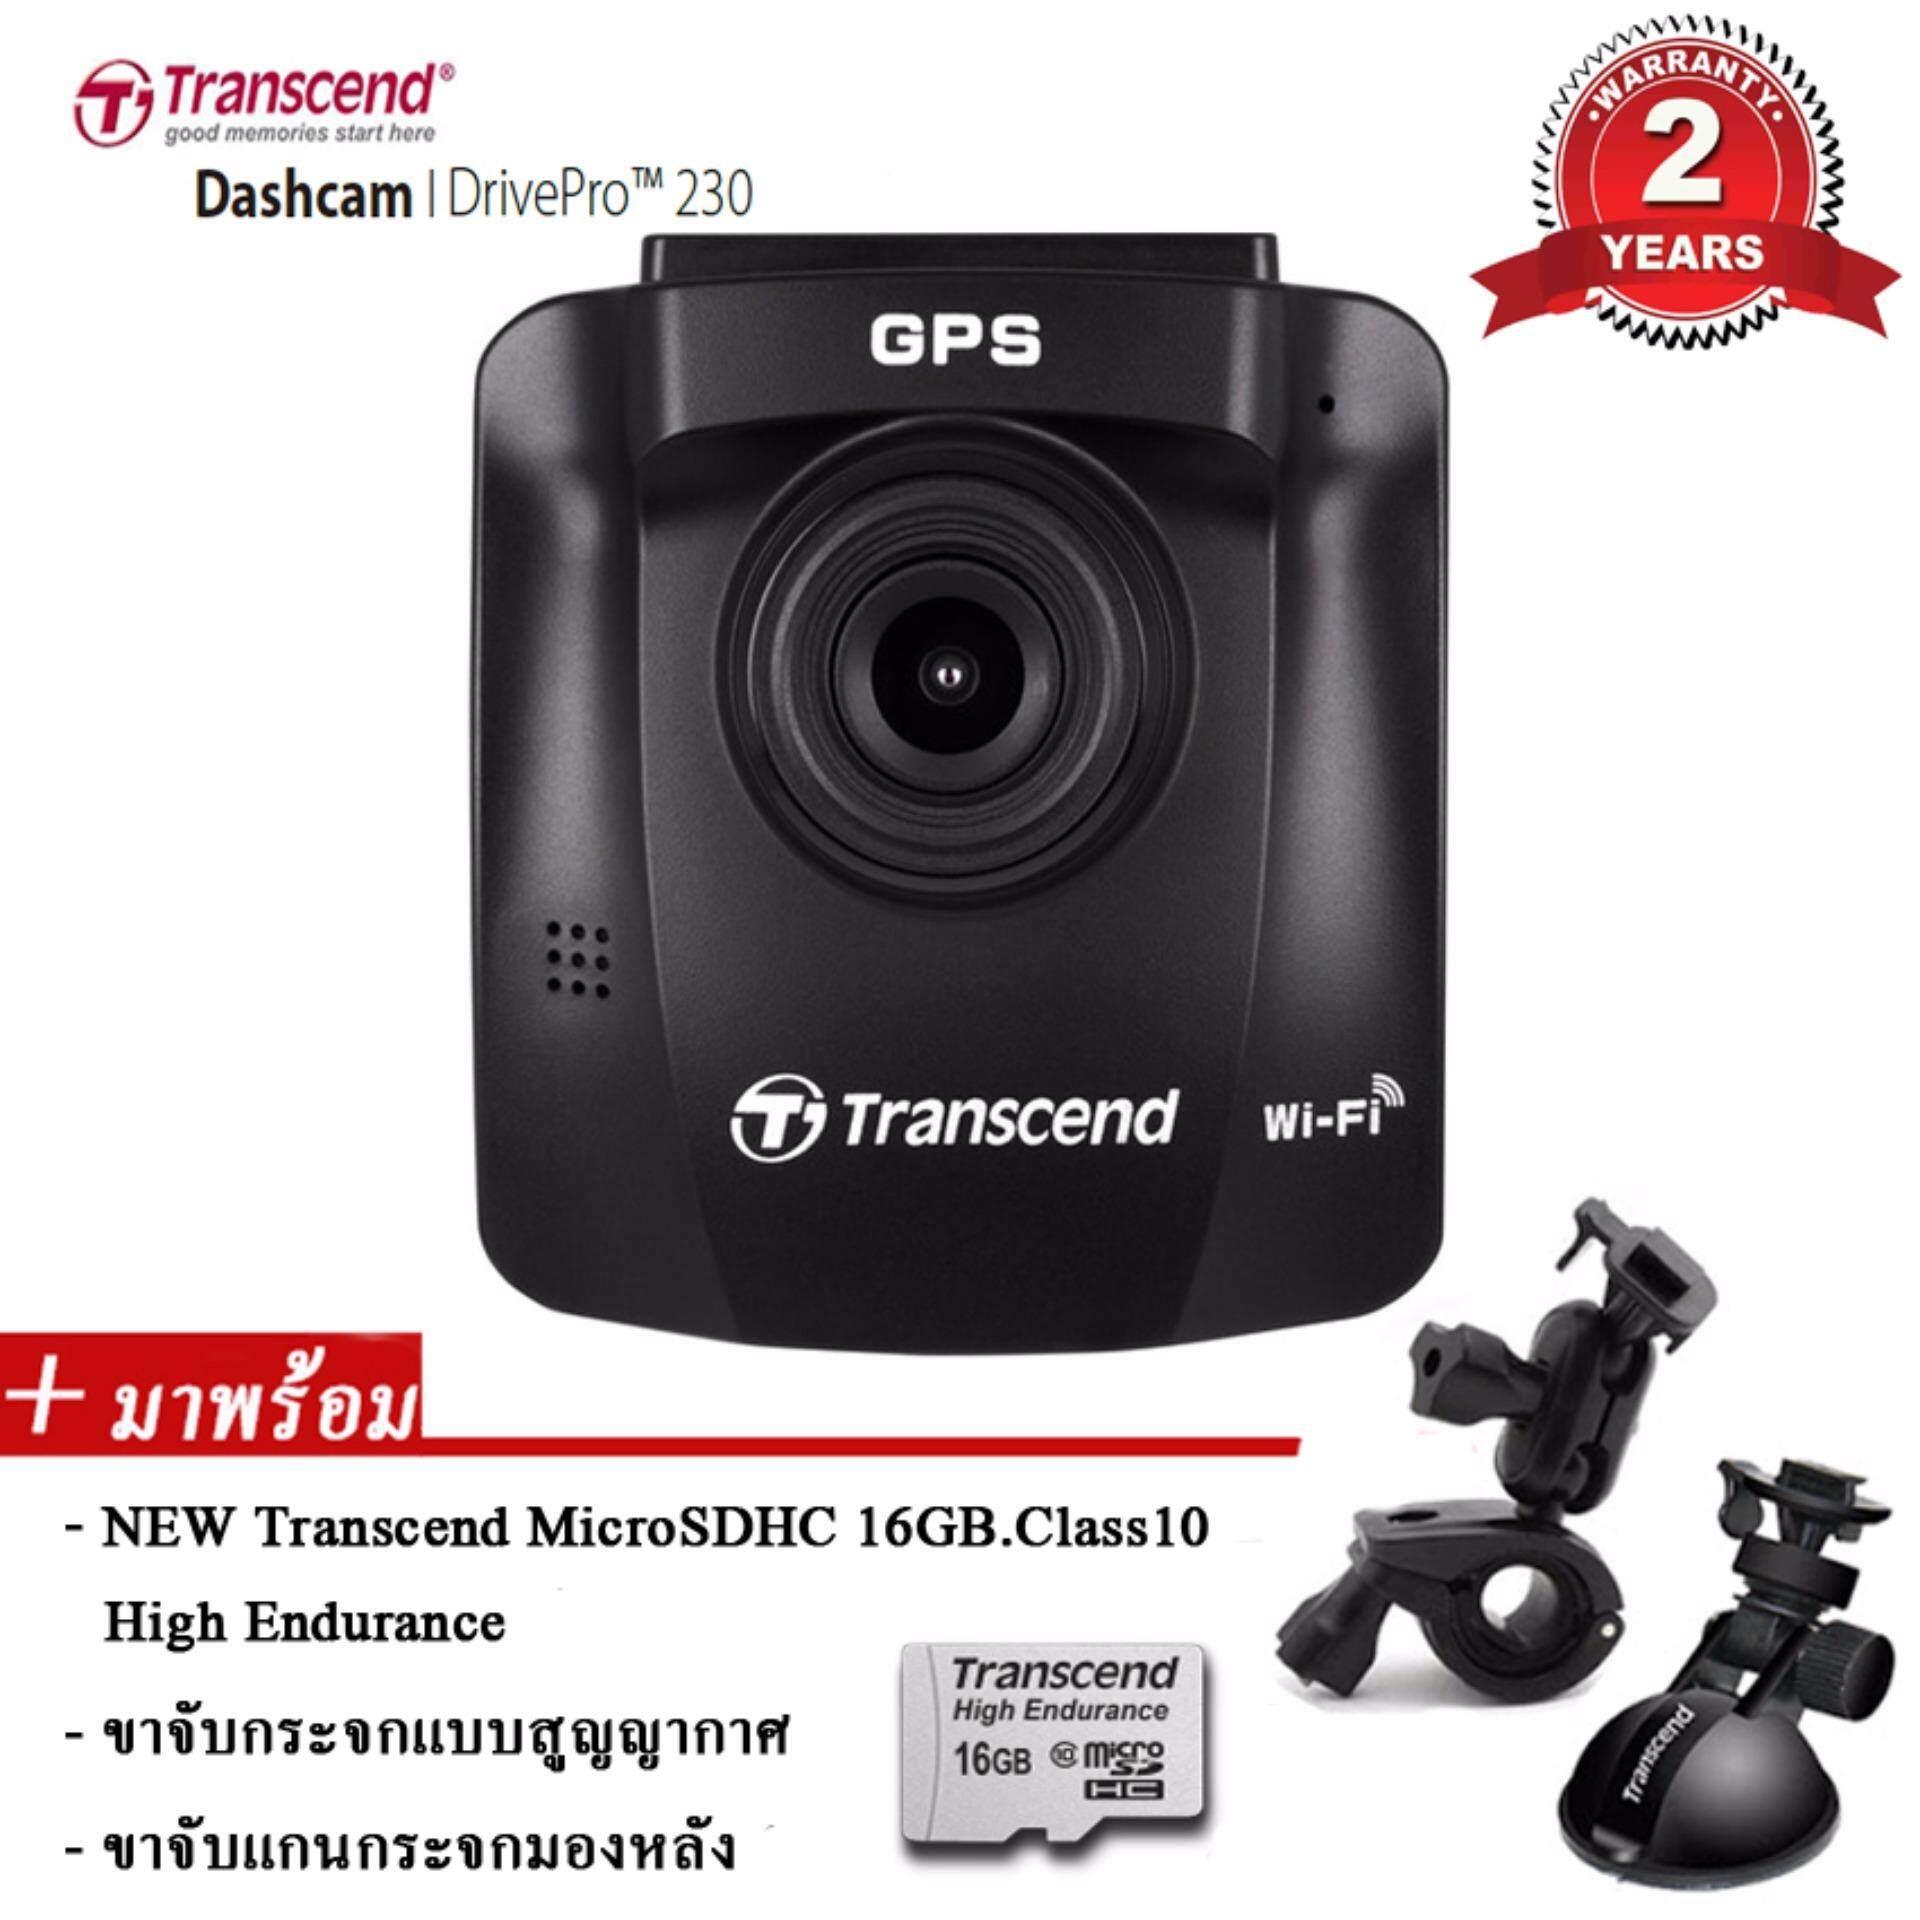 Transcend กล้องติดรถยนต์ DrivePro230 Full HD 1080P(Black) + Transcend 16GB High Endurance memory card + ขาจับแกนกระจกมองหลัง (รับประกันศูนย์ 2ปี)